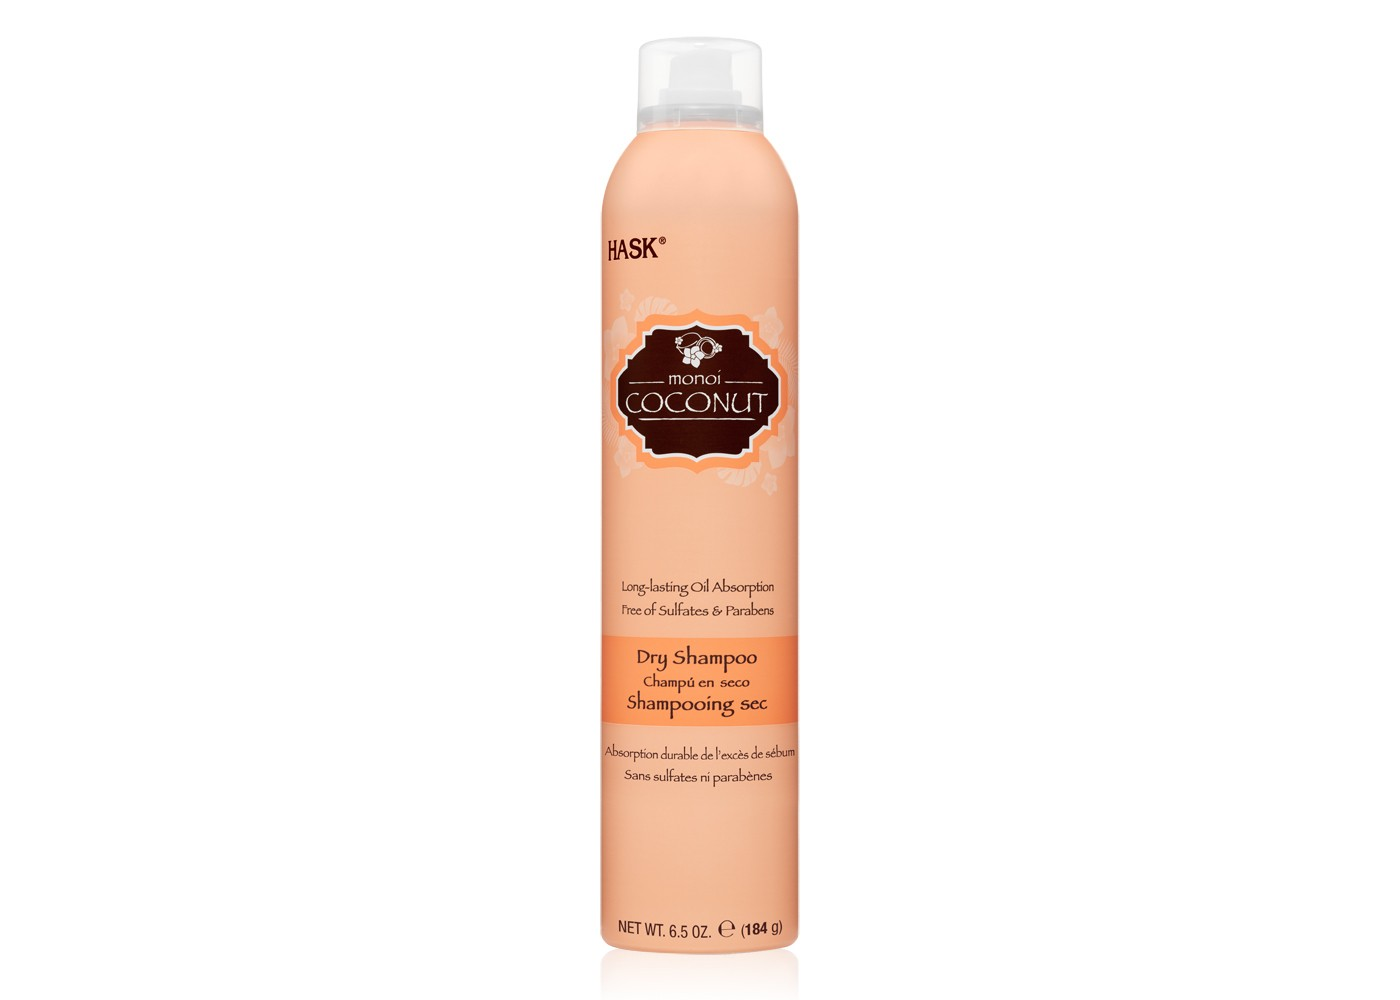 hask coconut dry shampoo.jpg